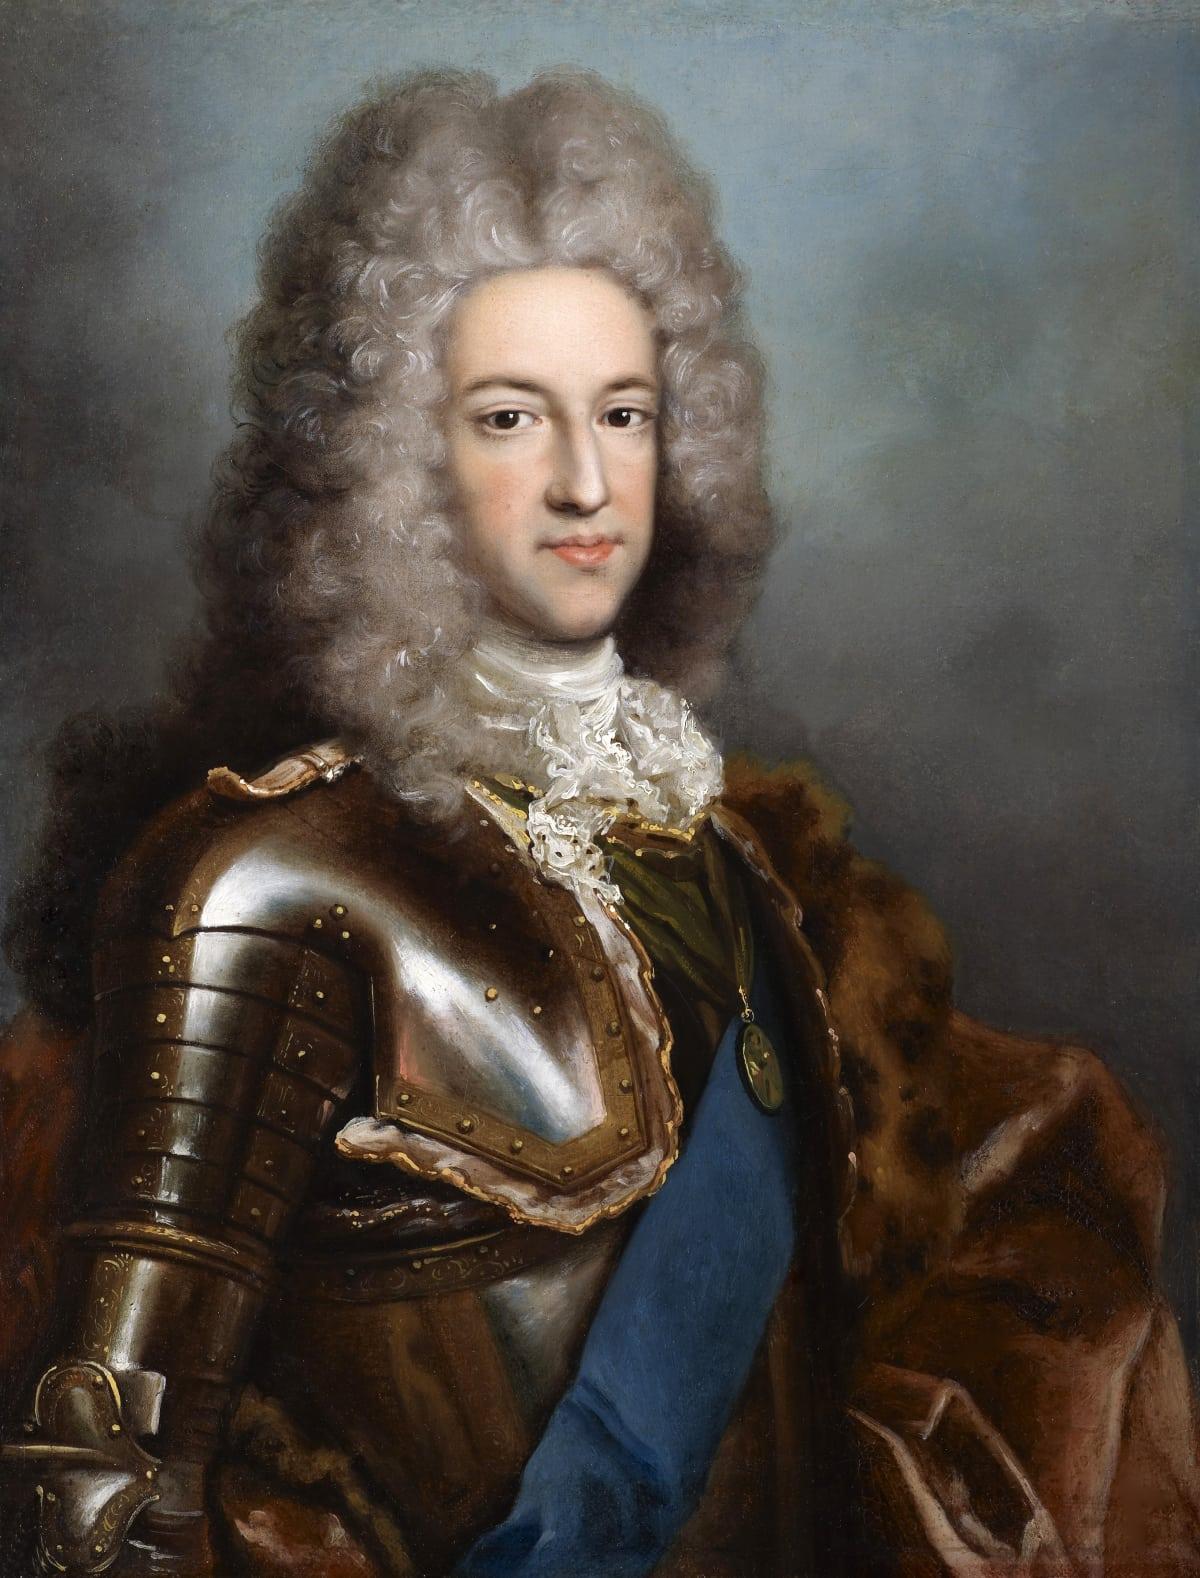 Antonio David (1684 – 1750) Prince James Edward Stuart, The Old Pretender (1688 – 1766), , circa 1717 - 1718 Oil on canvas 17 ¼ x 13 in. (44 x 33 cm.)